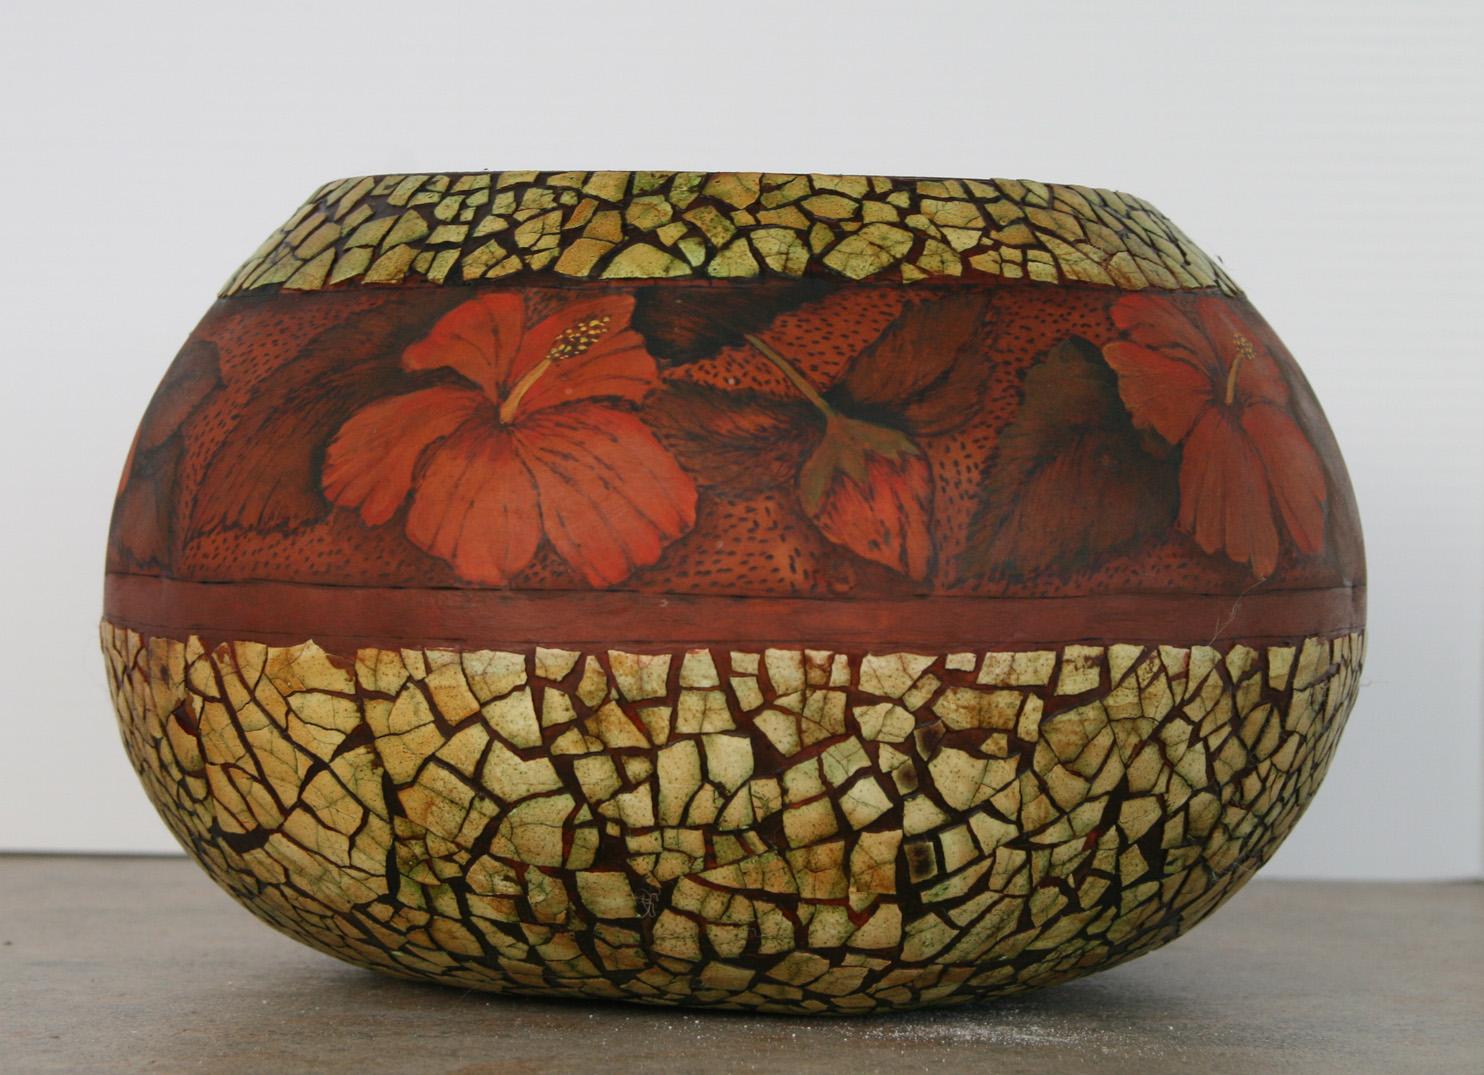 Eggshell mosaic won a merit ribbon